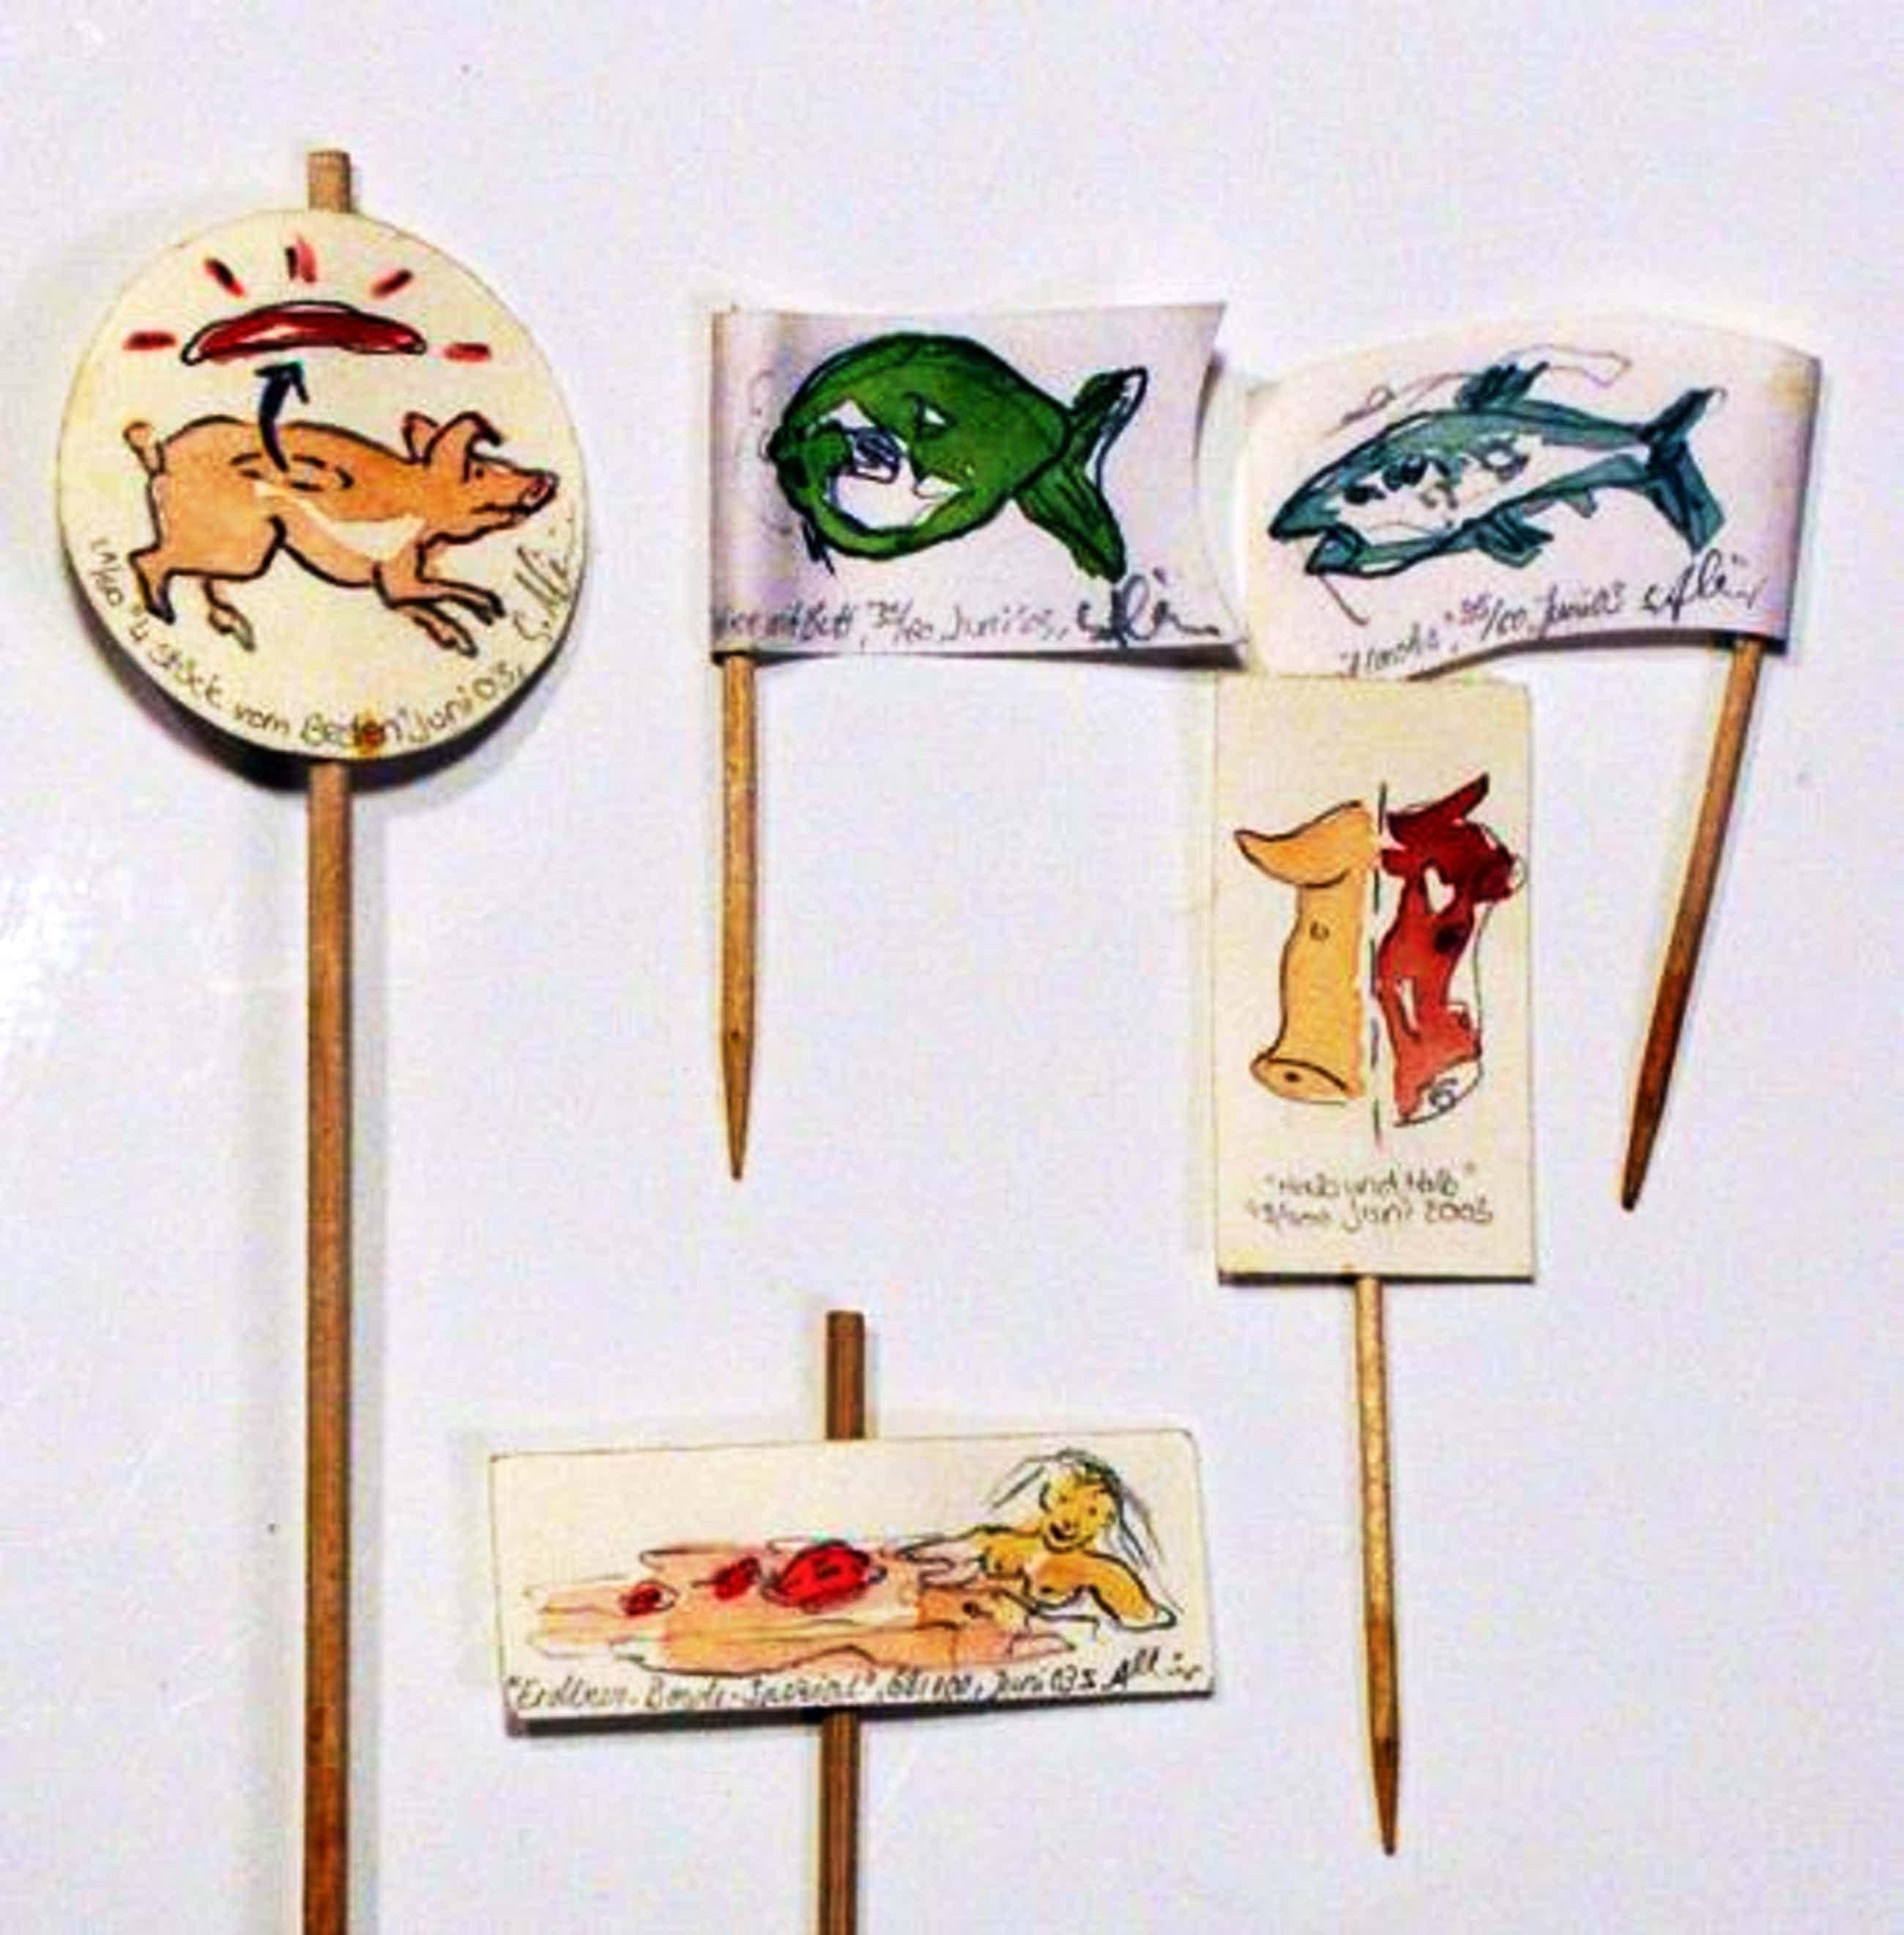 Sonja Alhäuser - Miniaturaquarelle aus Eat Art-Performance 2003 kopen? Bied vanaf 300!